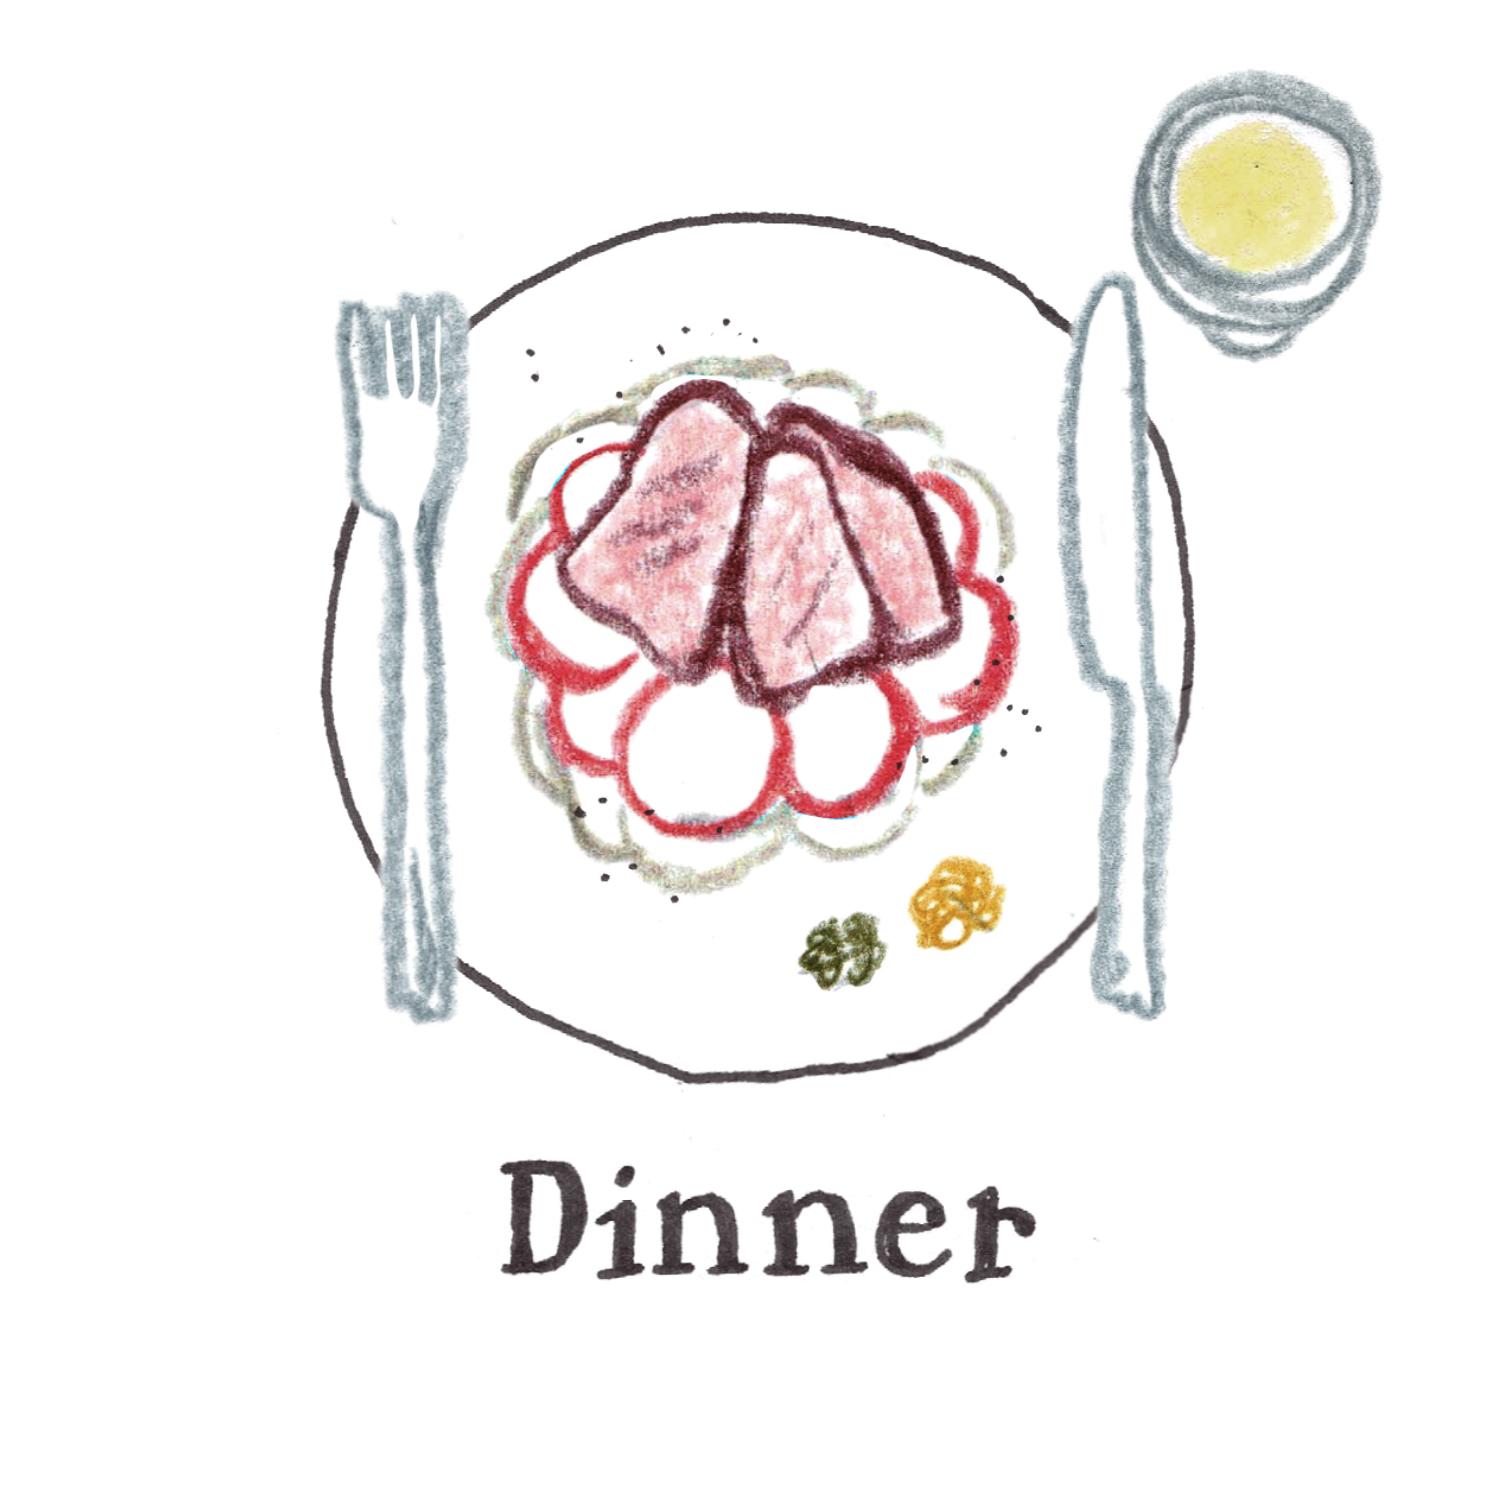 B:三つ星レストランディナー